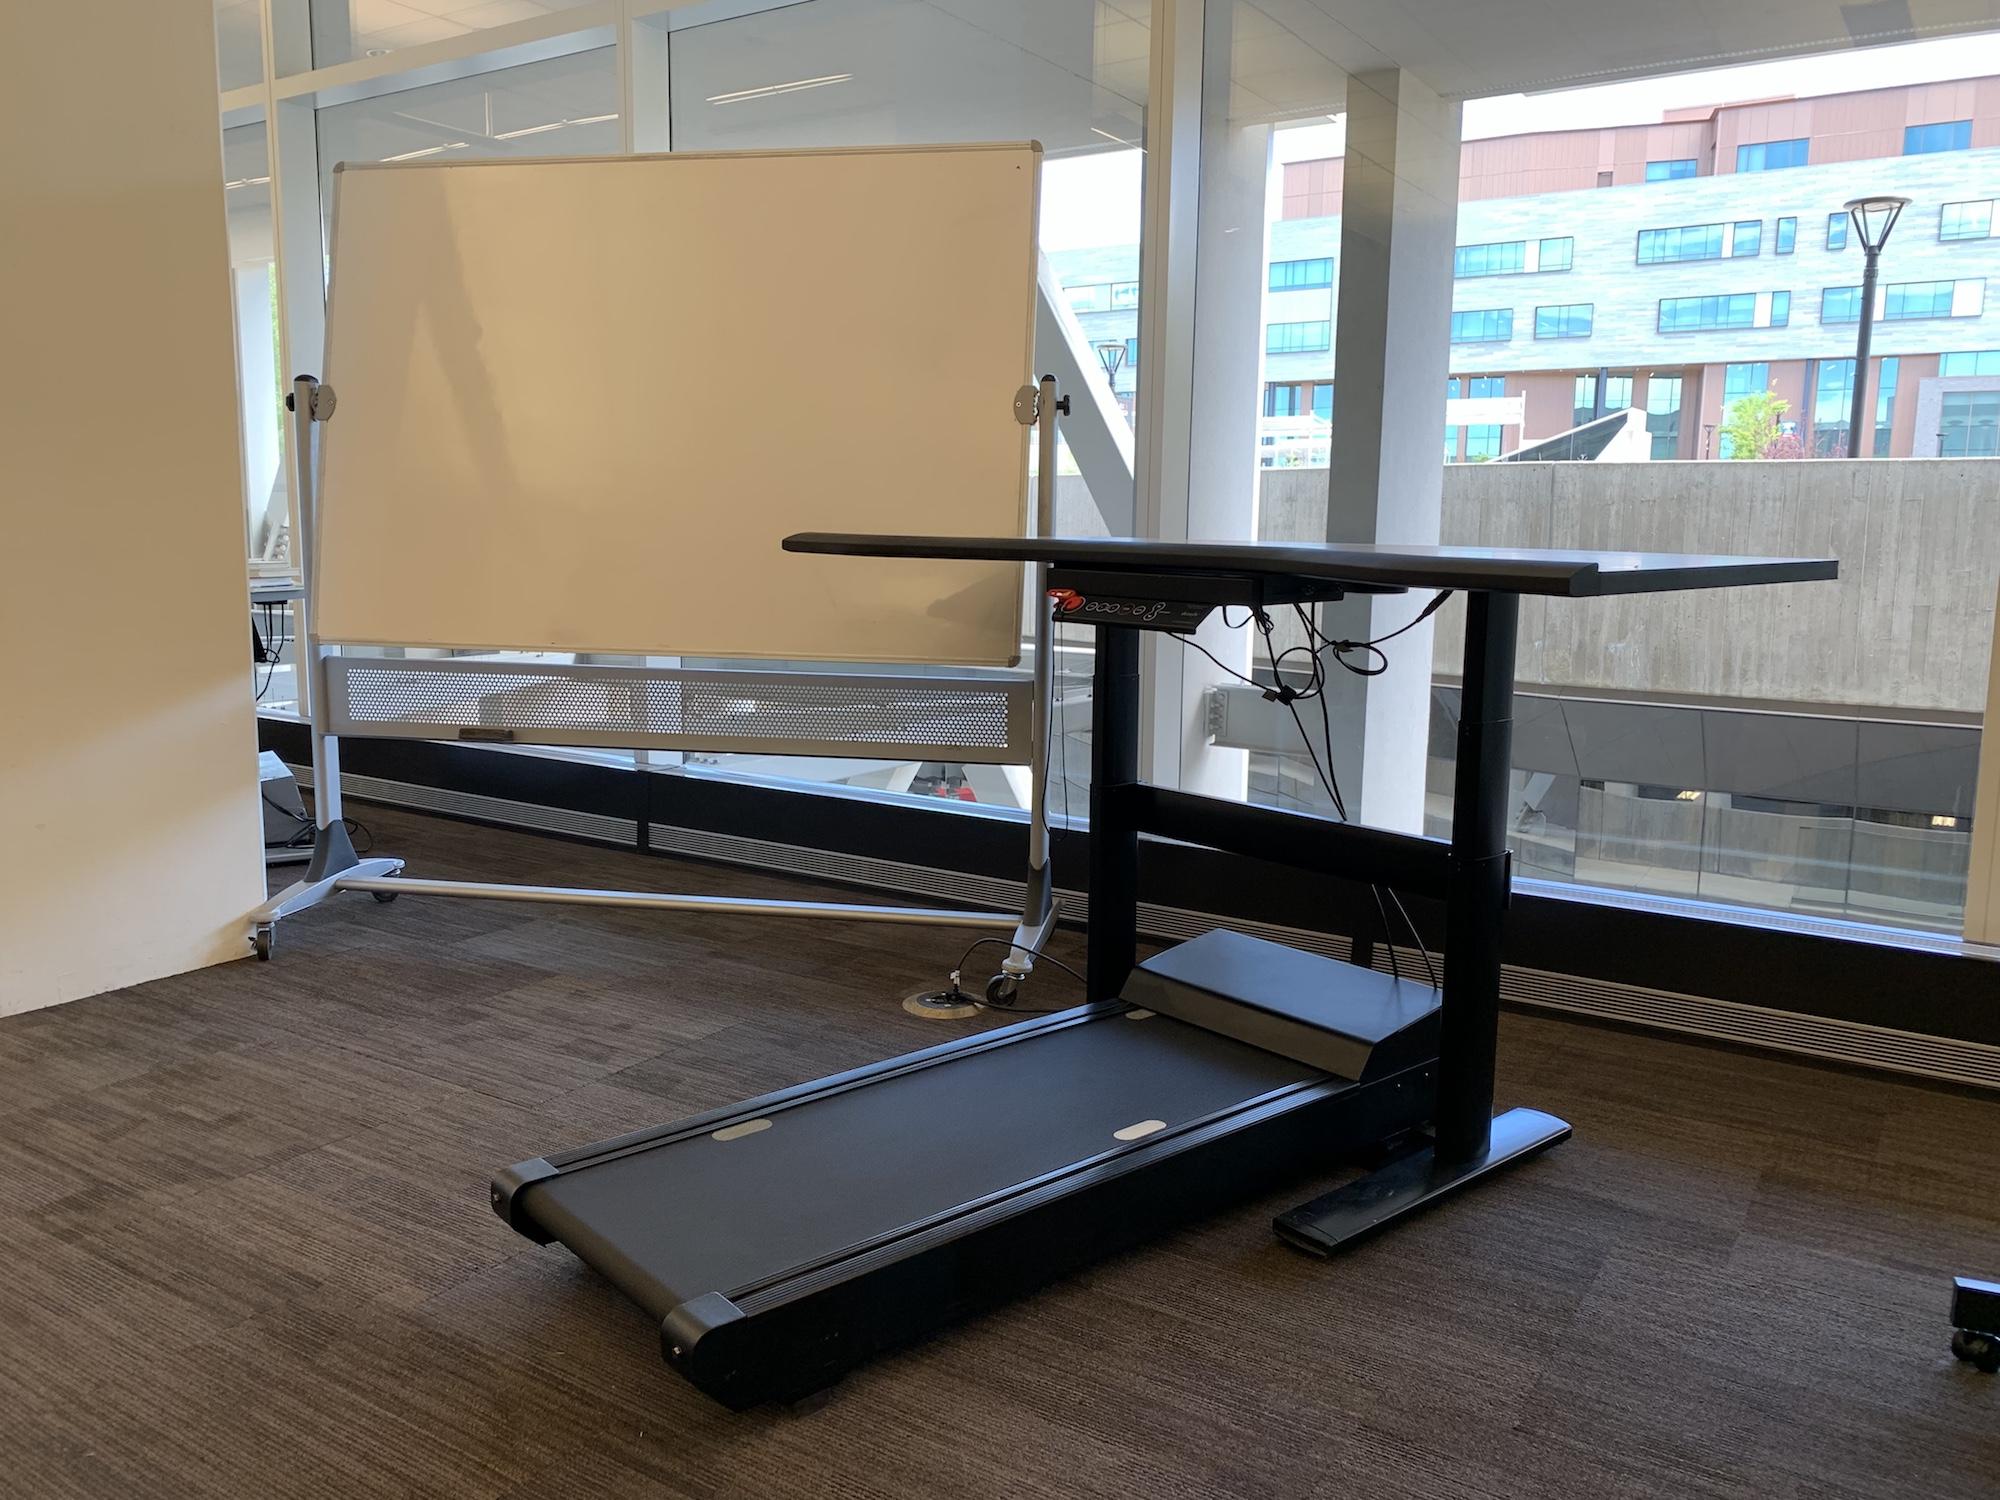 A treadmill desk and whiteboard.